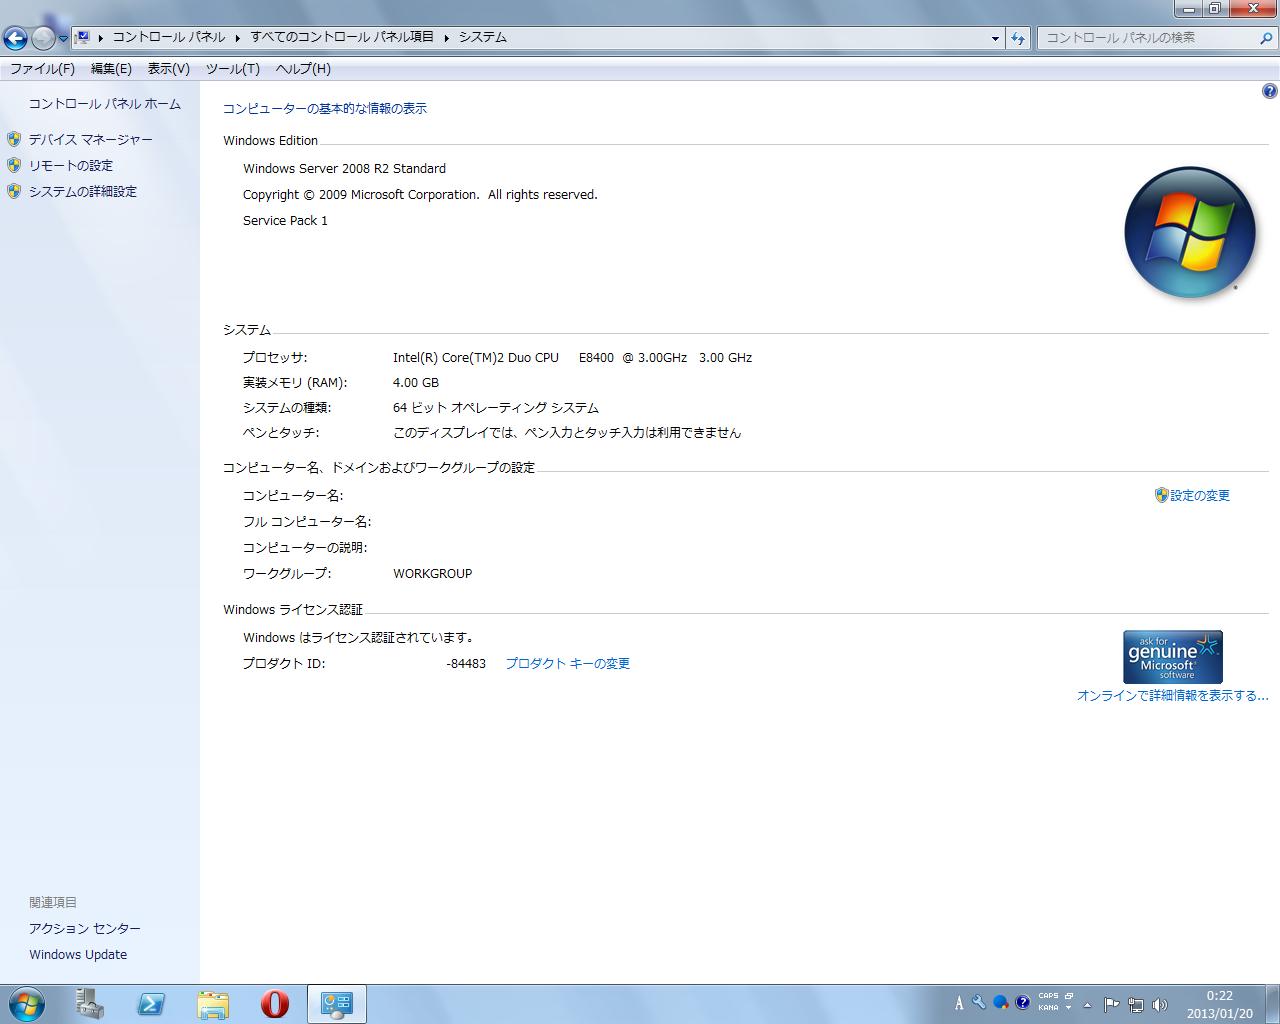 WindowsServer2008R2 システム